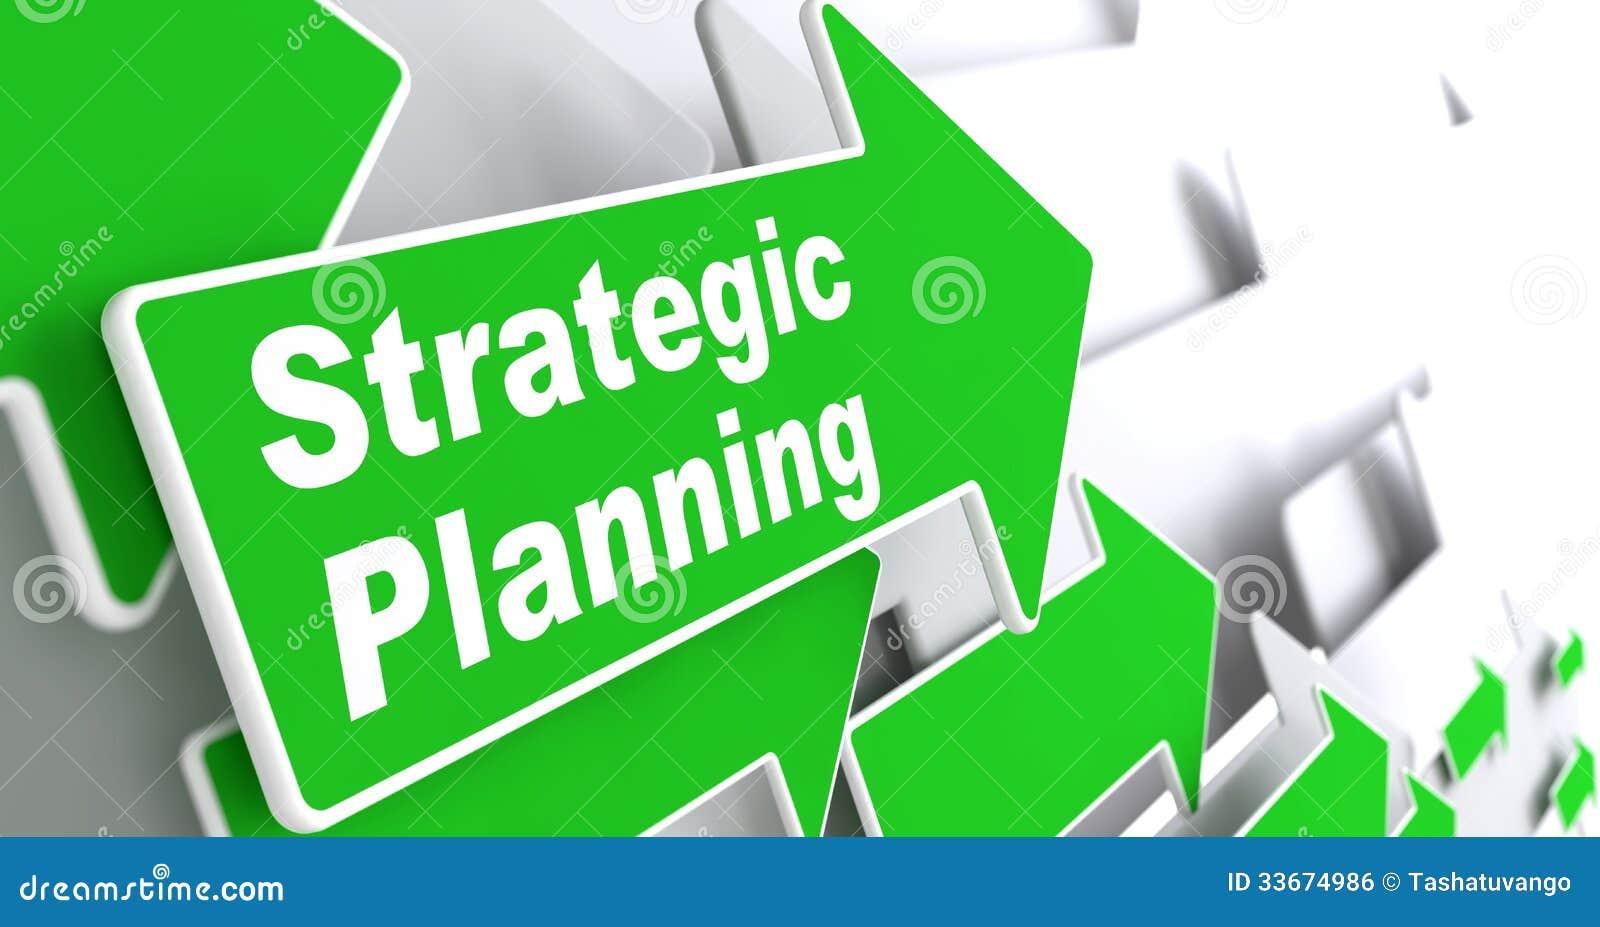 stratgic planning